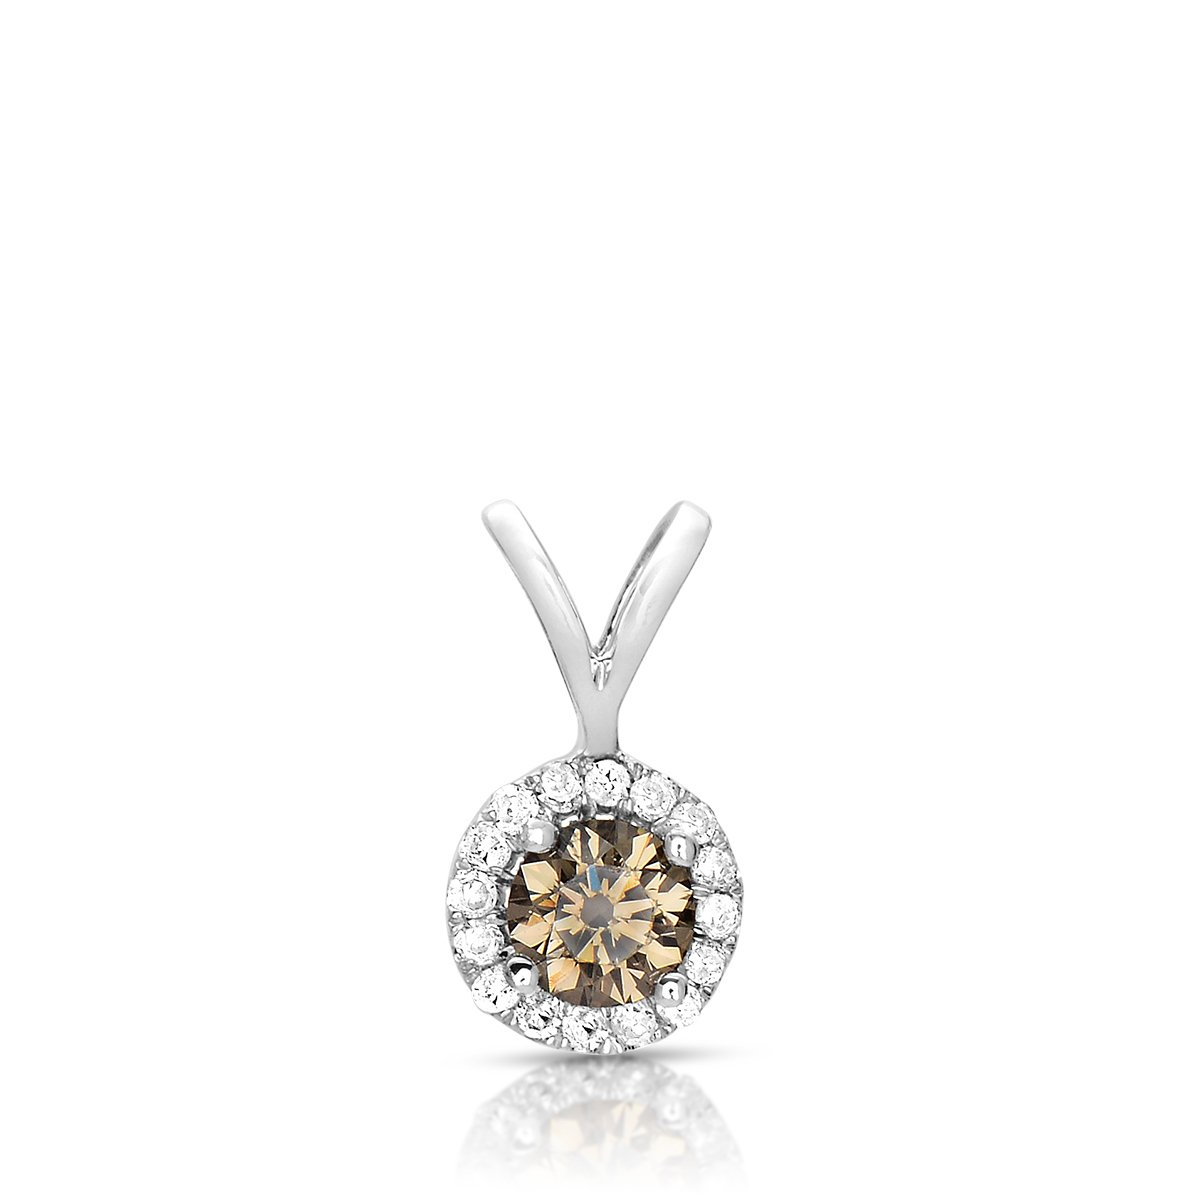 1 ct Chocolate Brown Diamond Halo 14k White Gold Pendant Necklace Set (K1295-100WBR)